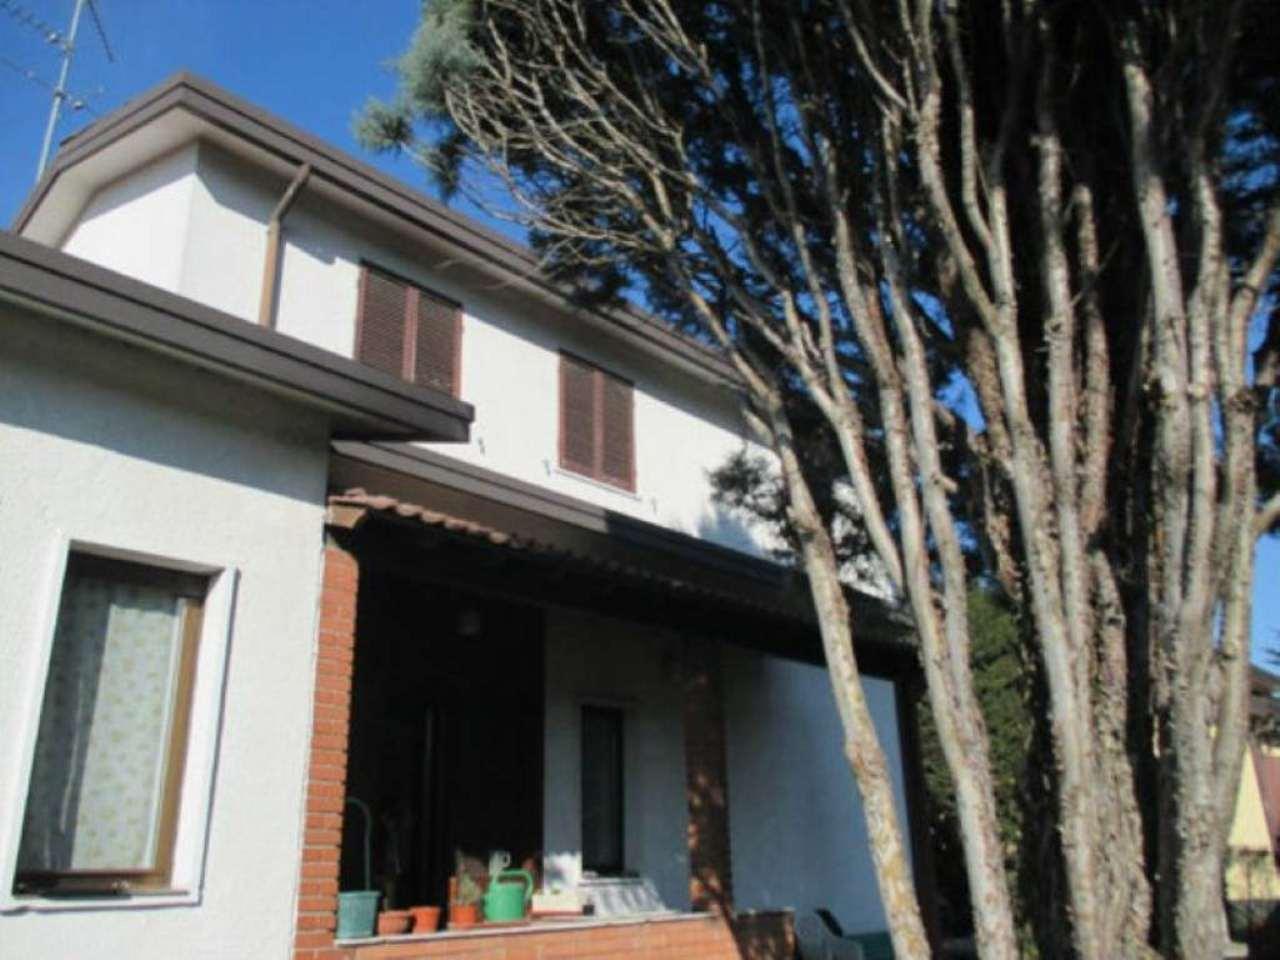 Villa in Vendita a Segrate: 5 locali, 246 mq